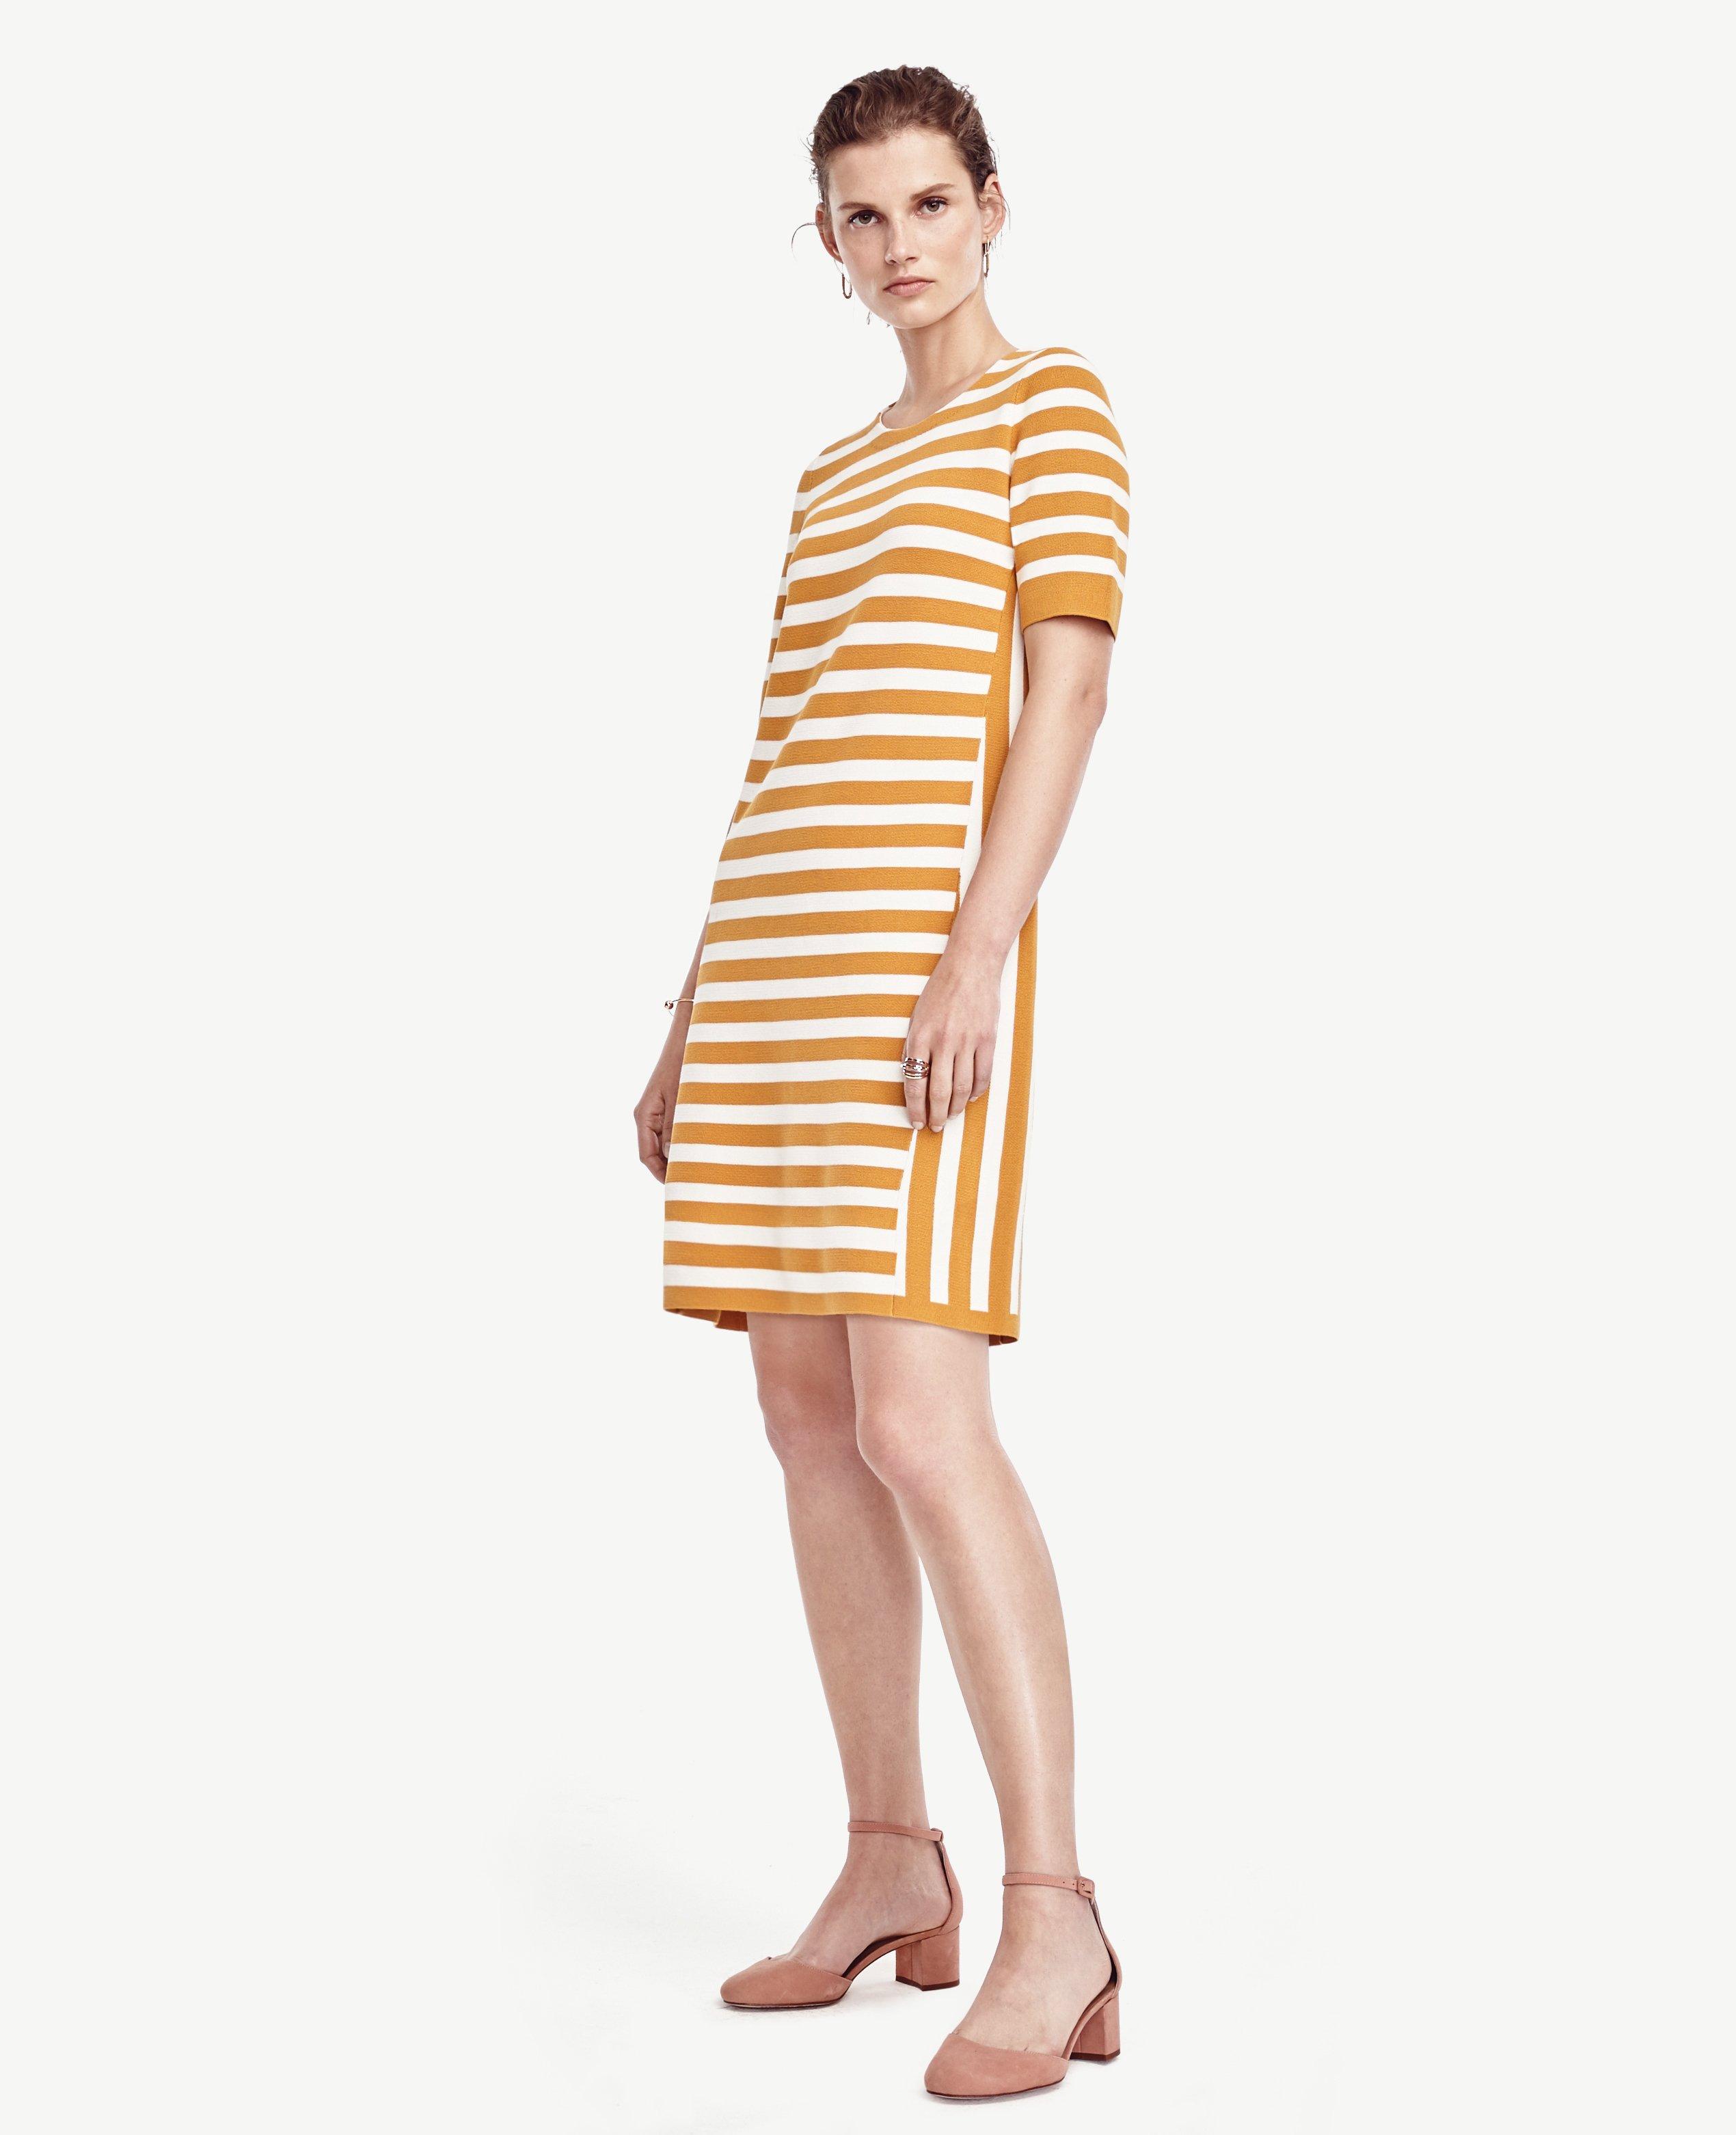 Ann taylor Petite Striped Short Sleeve Sweater Dress in Yellow | Lyst